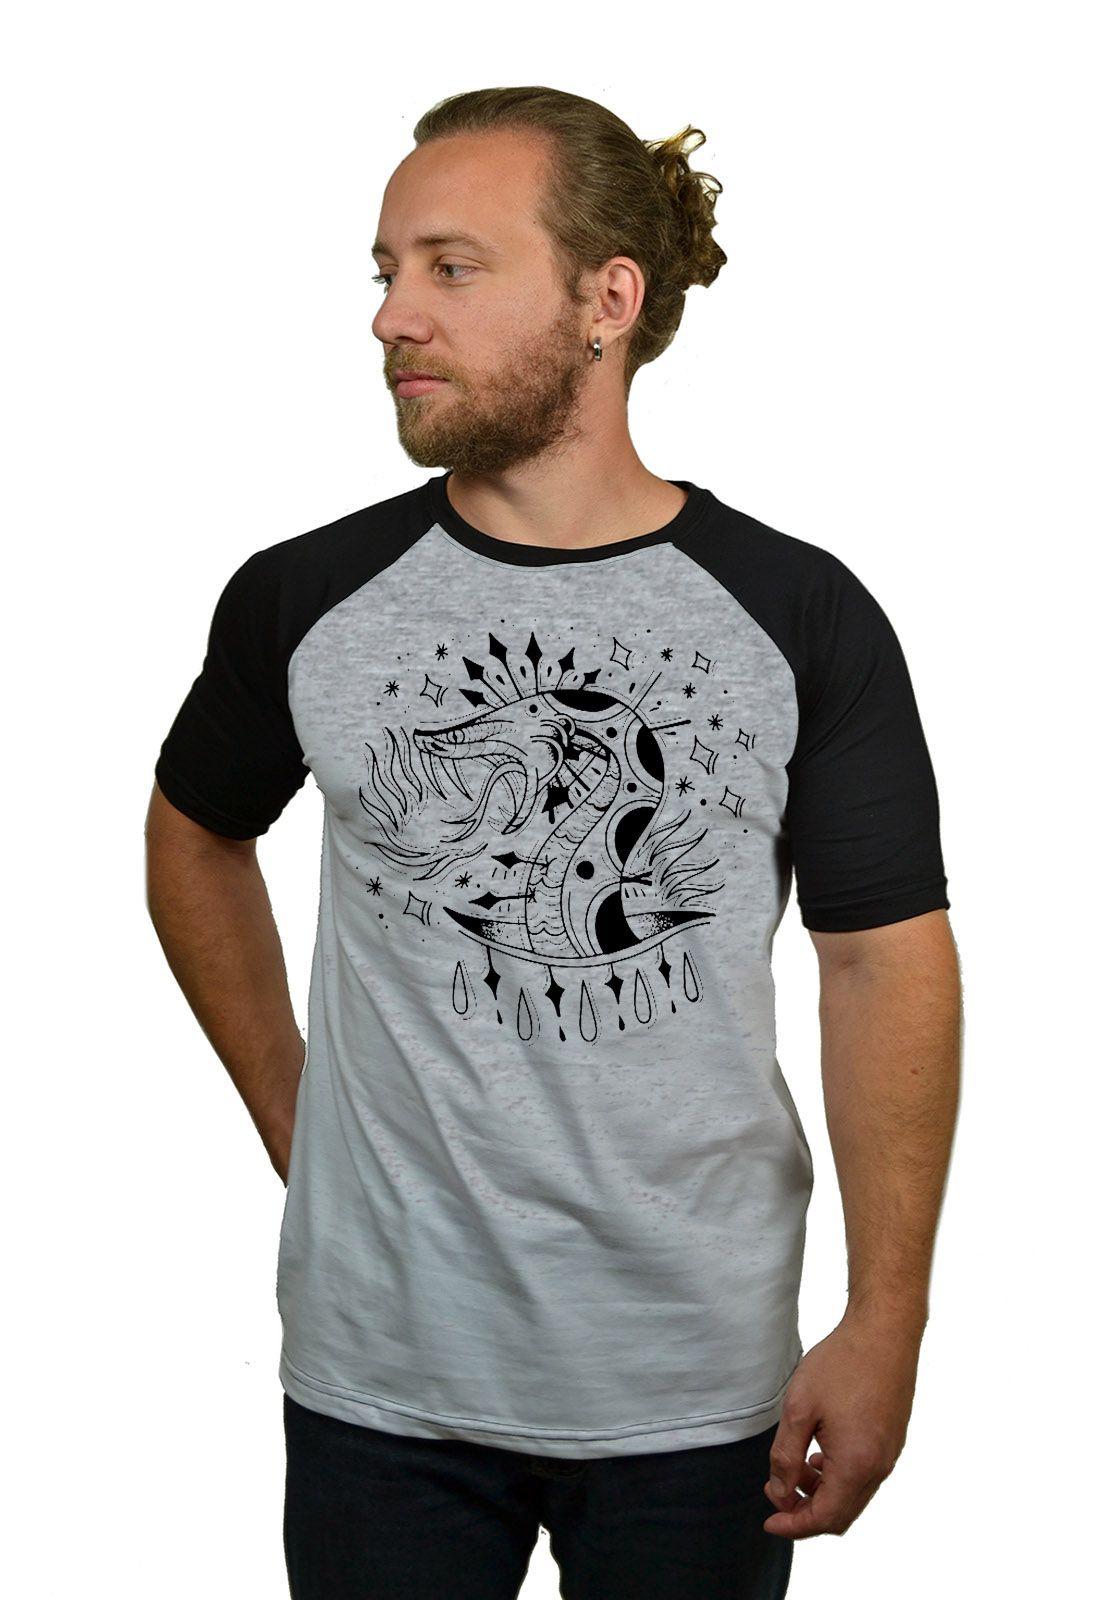 Camiseta Raglan Hshop Snake - Cinza Mescla com Preto  - HShop